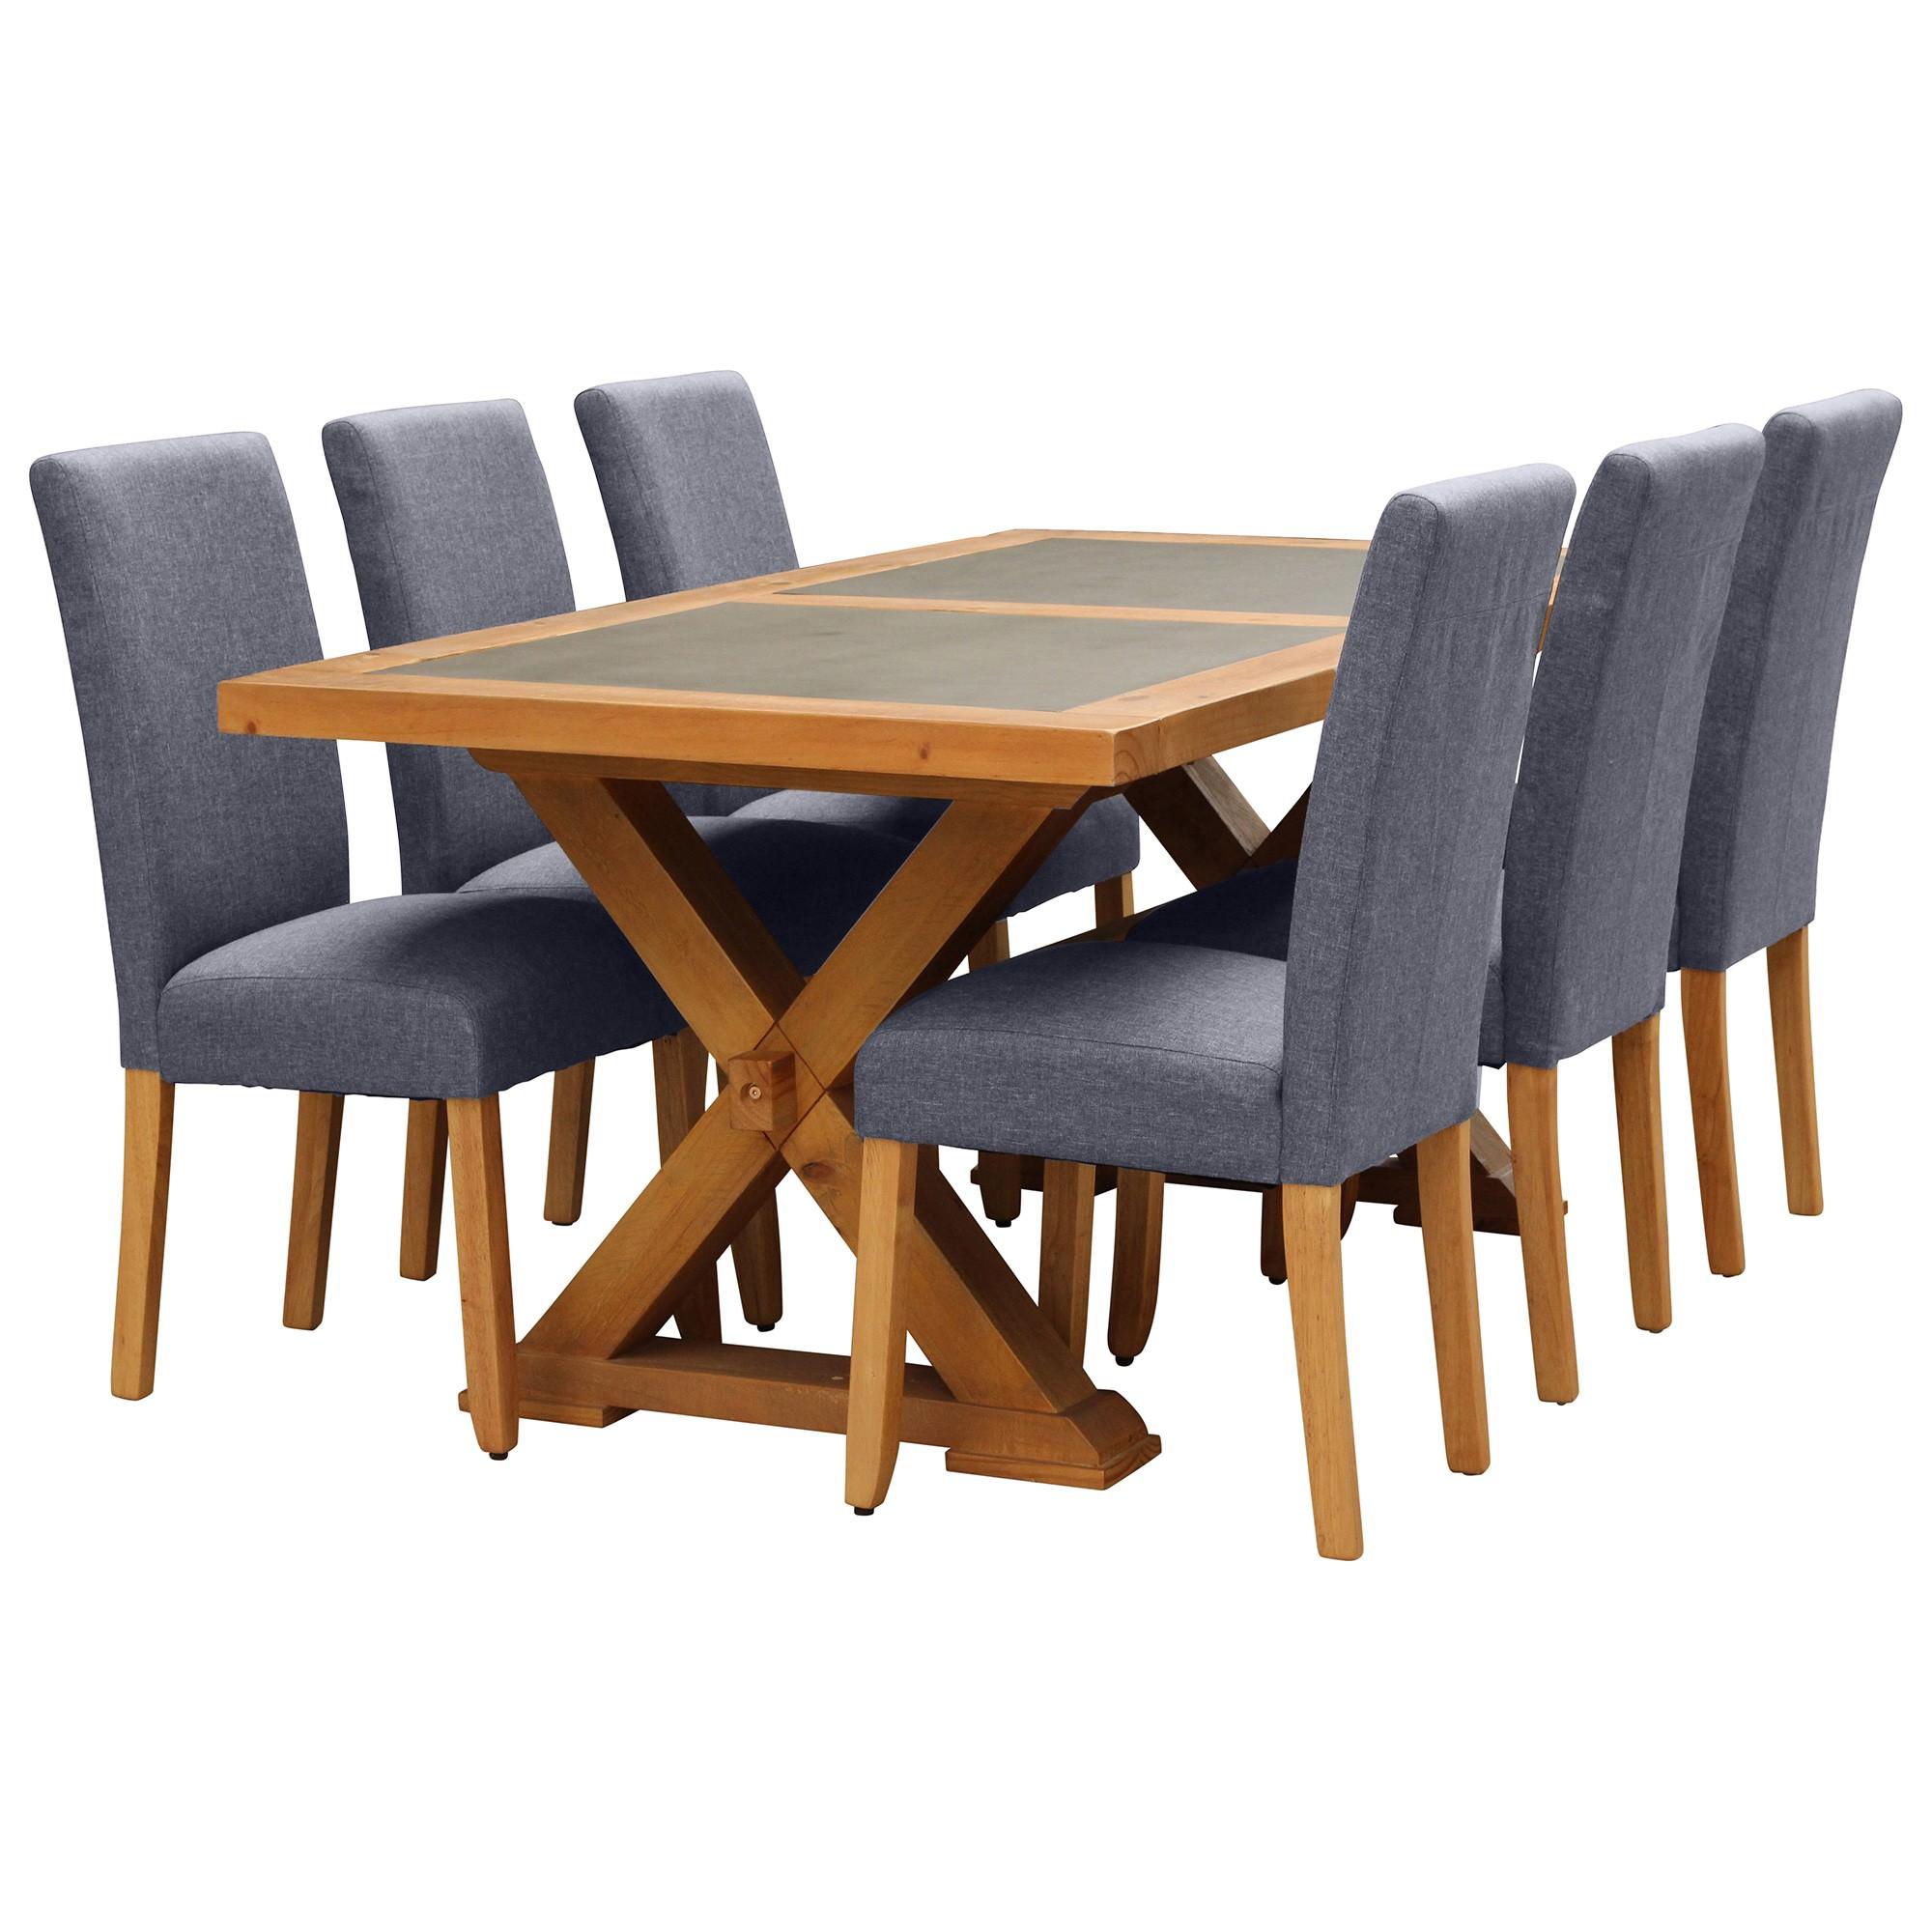 Sefton 9 Piece Pine Timber Dining Table Set, 210cm, Light Grey Arwen Chair